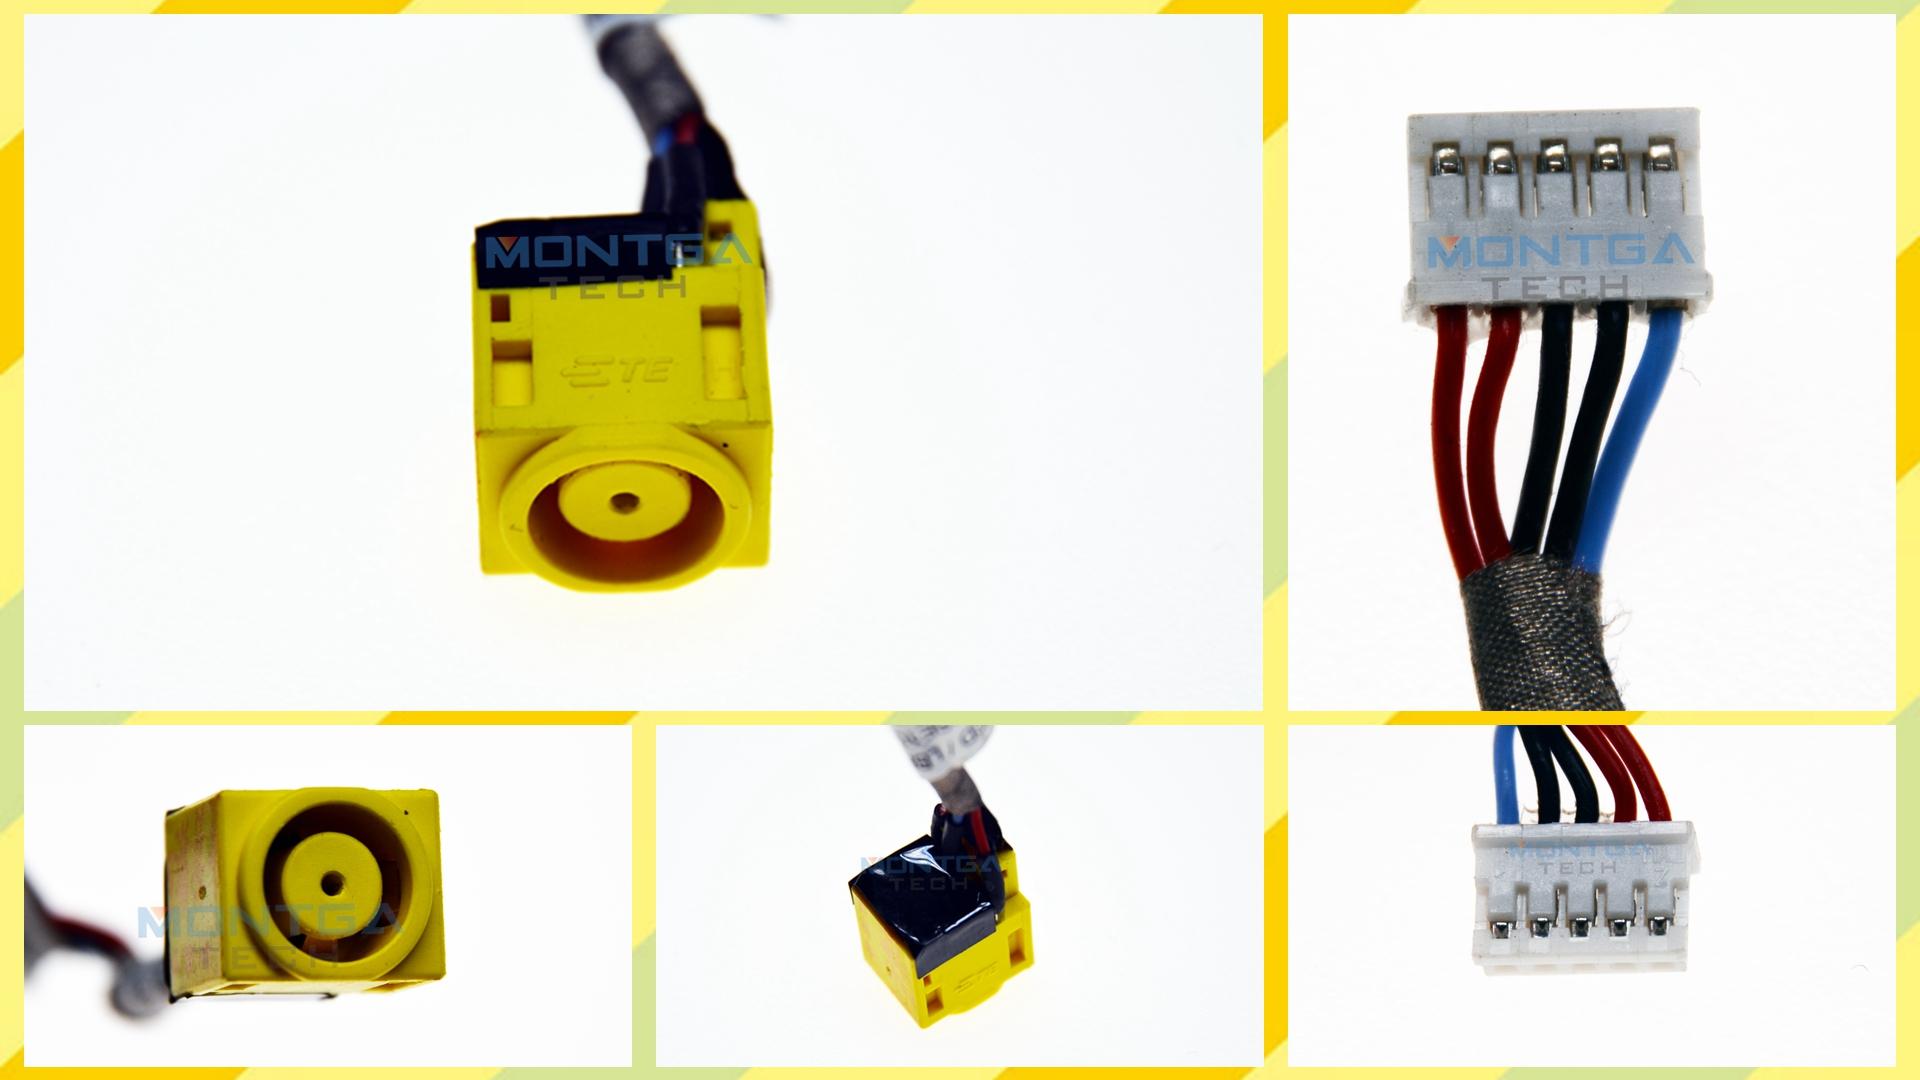 Lenovo L430 charging connector, Lenovo L430 DC Power Jack, Lenovo L430 DC IN Cable, Lenovo L430 Power Jack, Lenovo L430 plug, Lenovo L430 Jack socket, Lenovo L430 connecteur de charge,